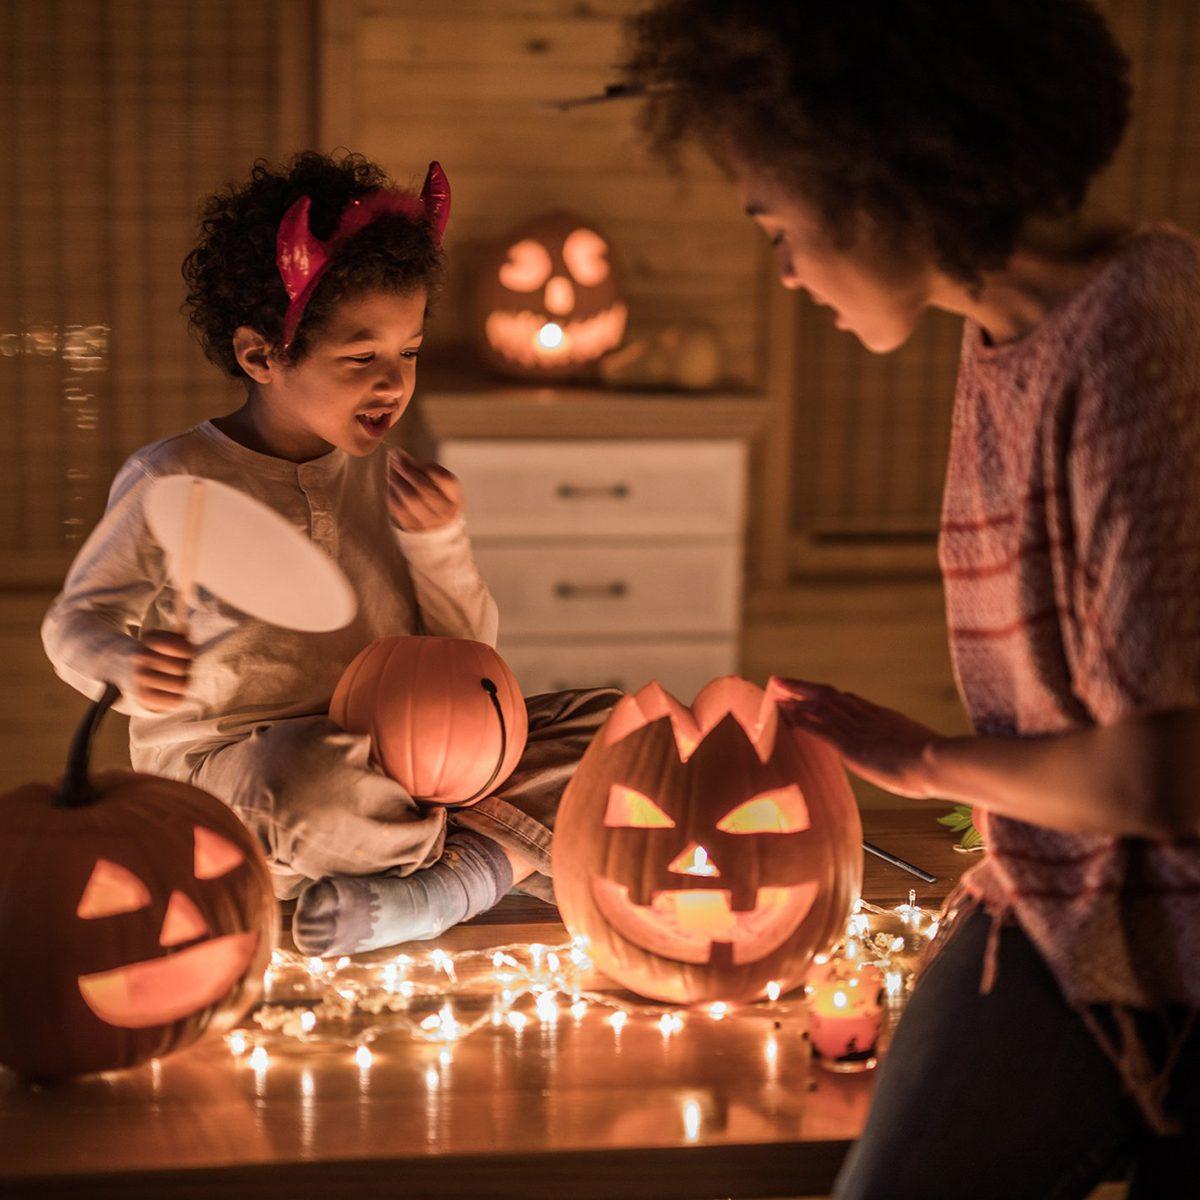 Mother and child lighting jack-o-lanterns